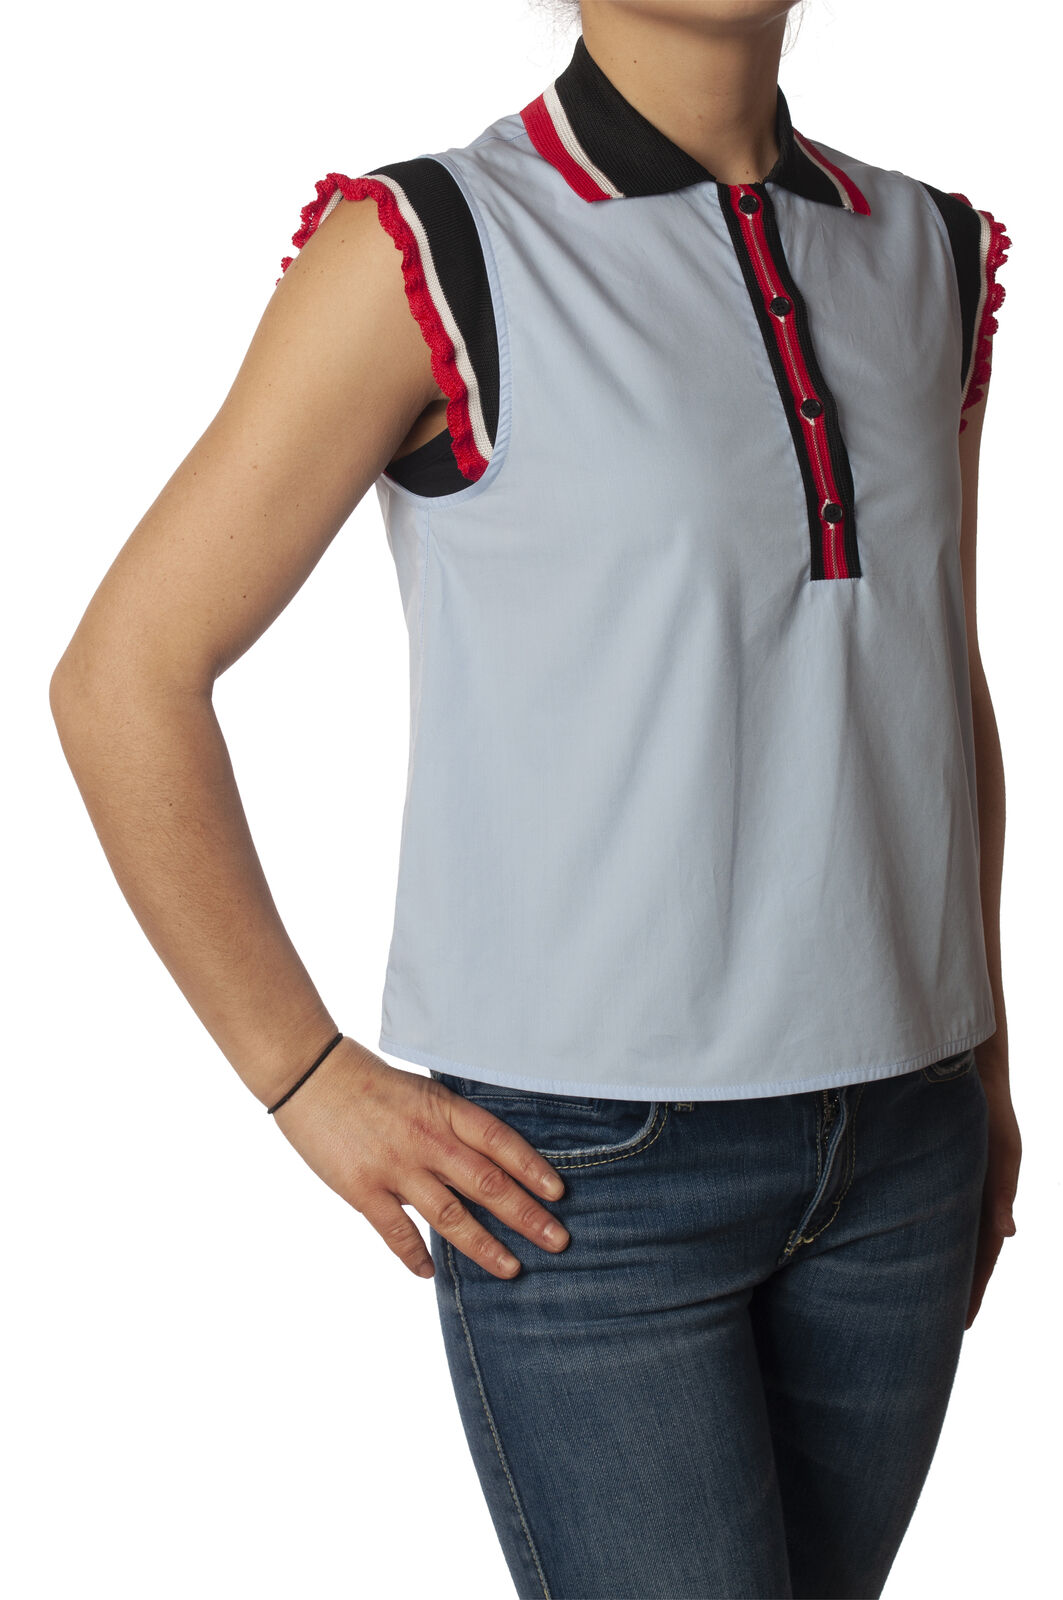 Pinko - Shirts-Shirt - Woman - bluee - 5877209E191159